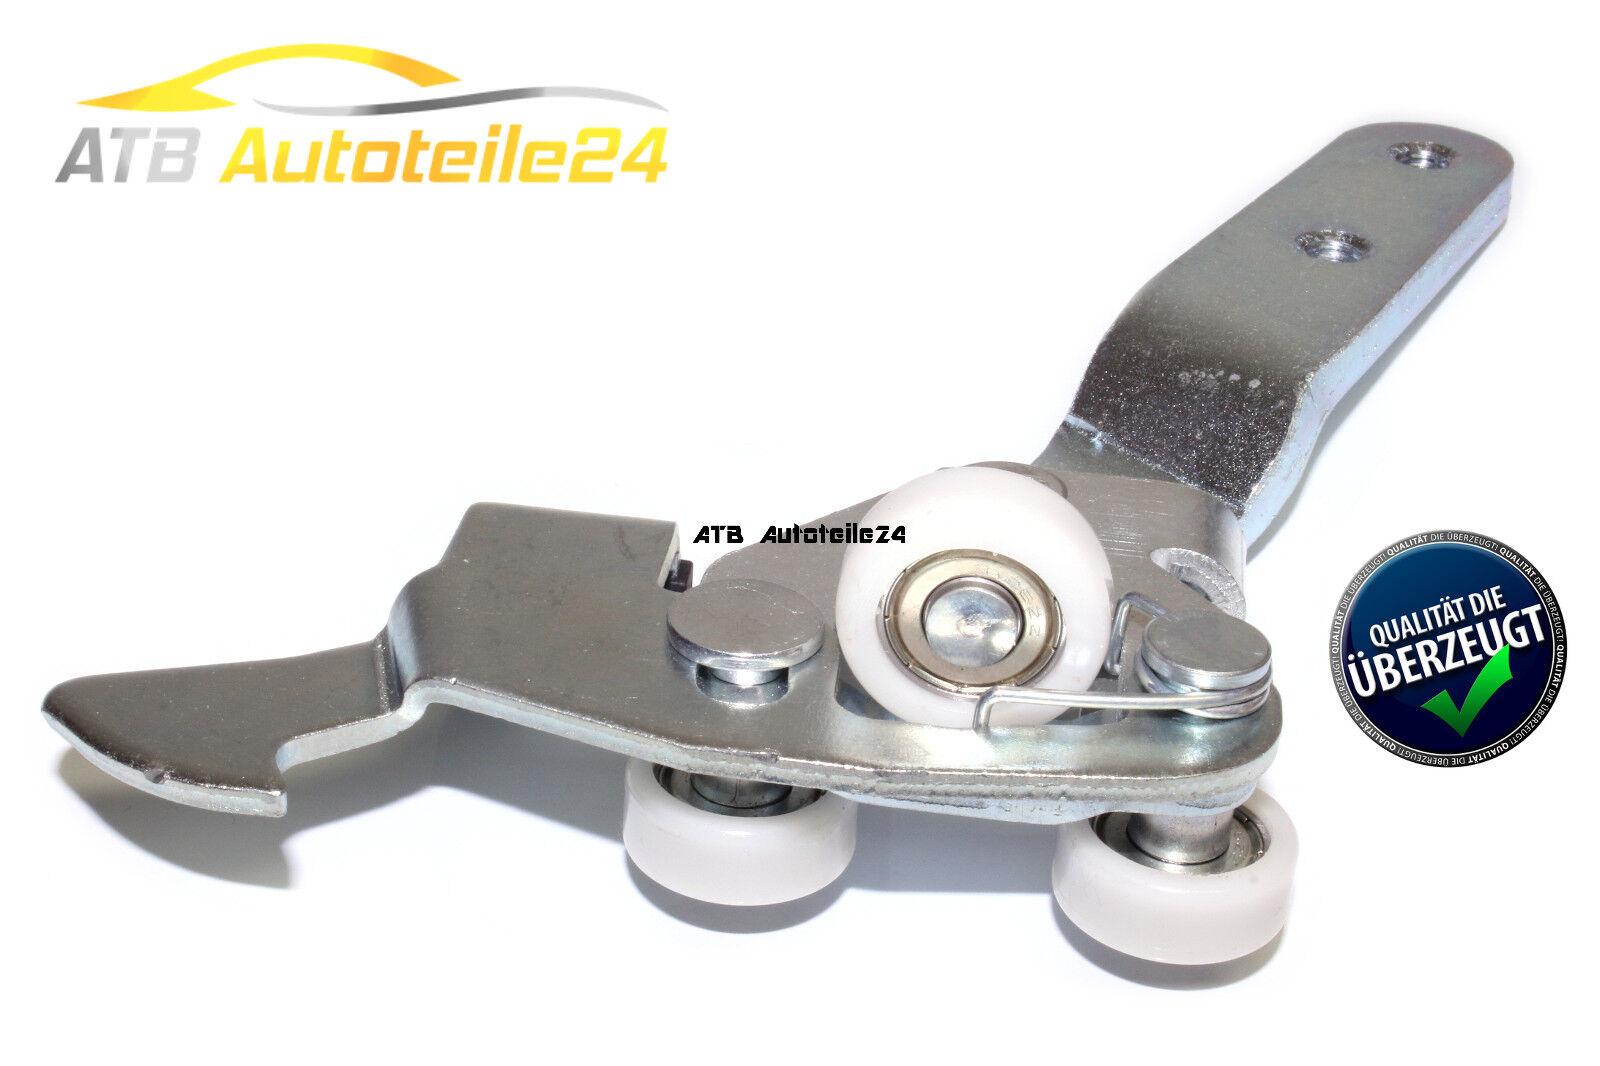 Fiat Ducato Rodillo De Puerta Corredera Runner mecanismo de bisagra Kit de reparación X 1